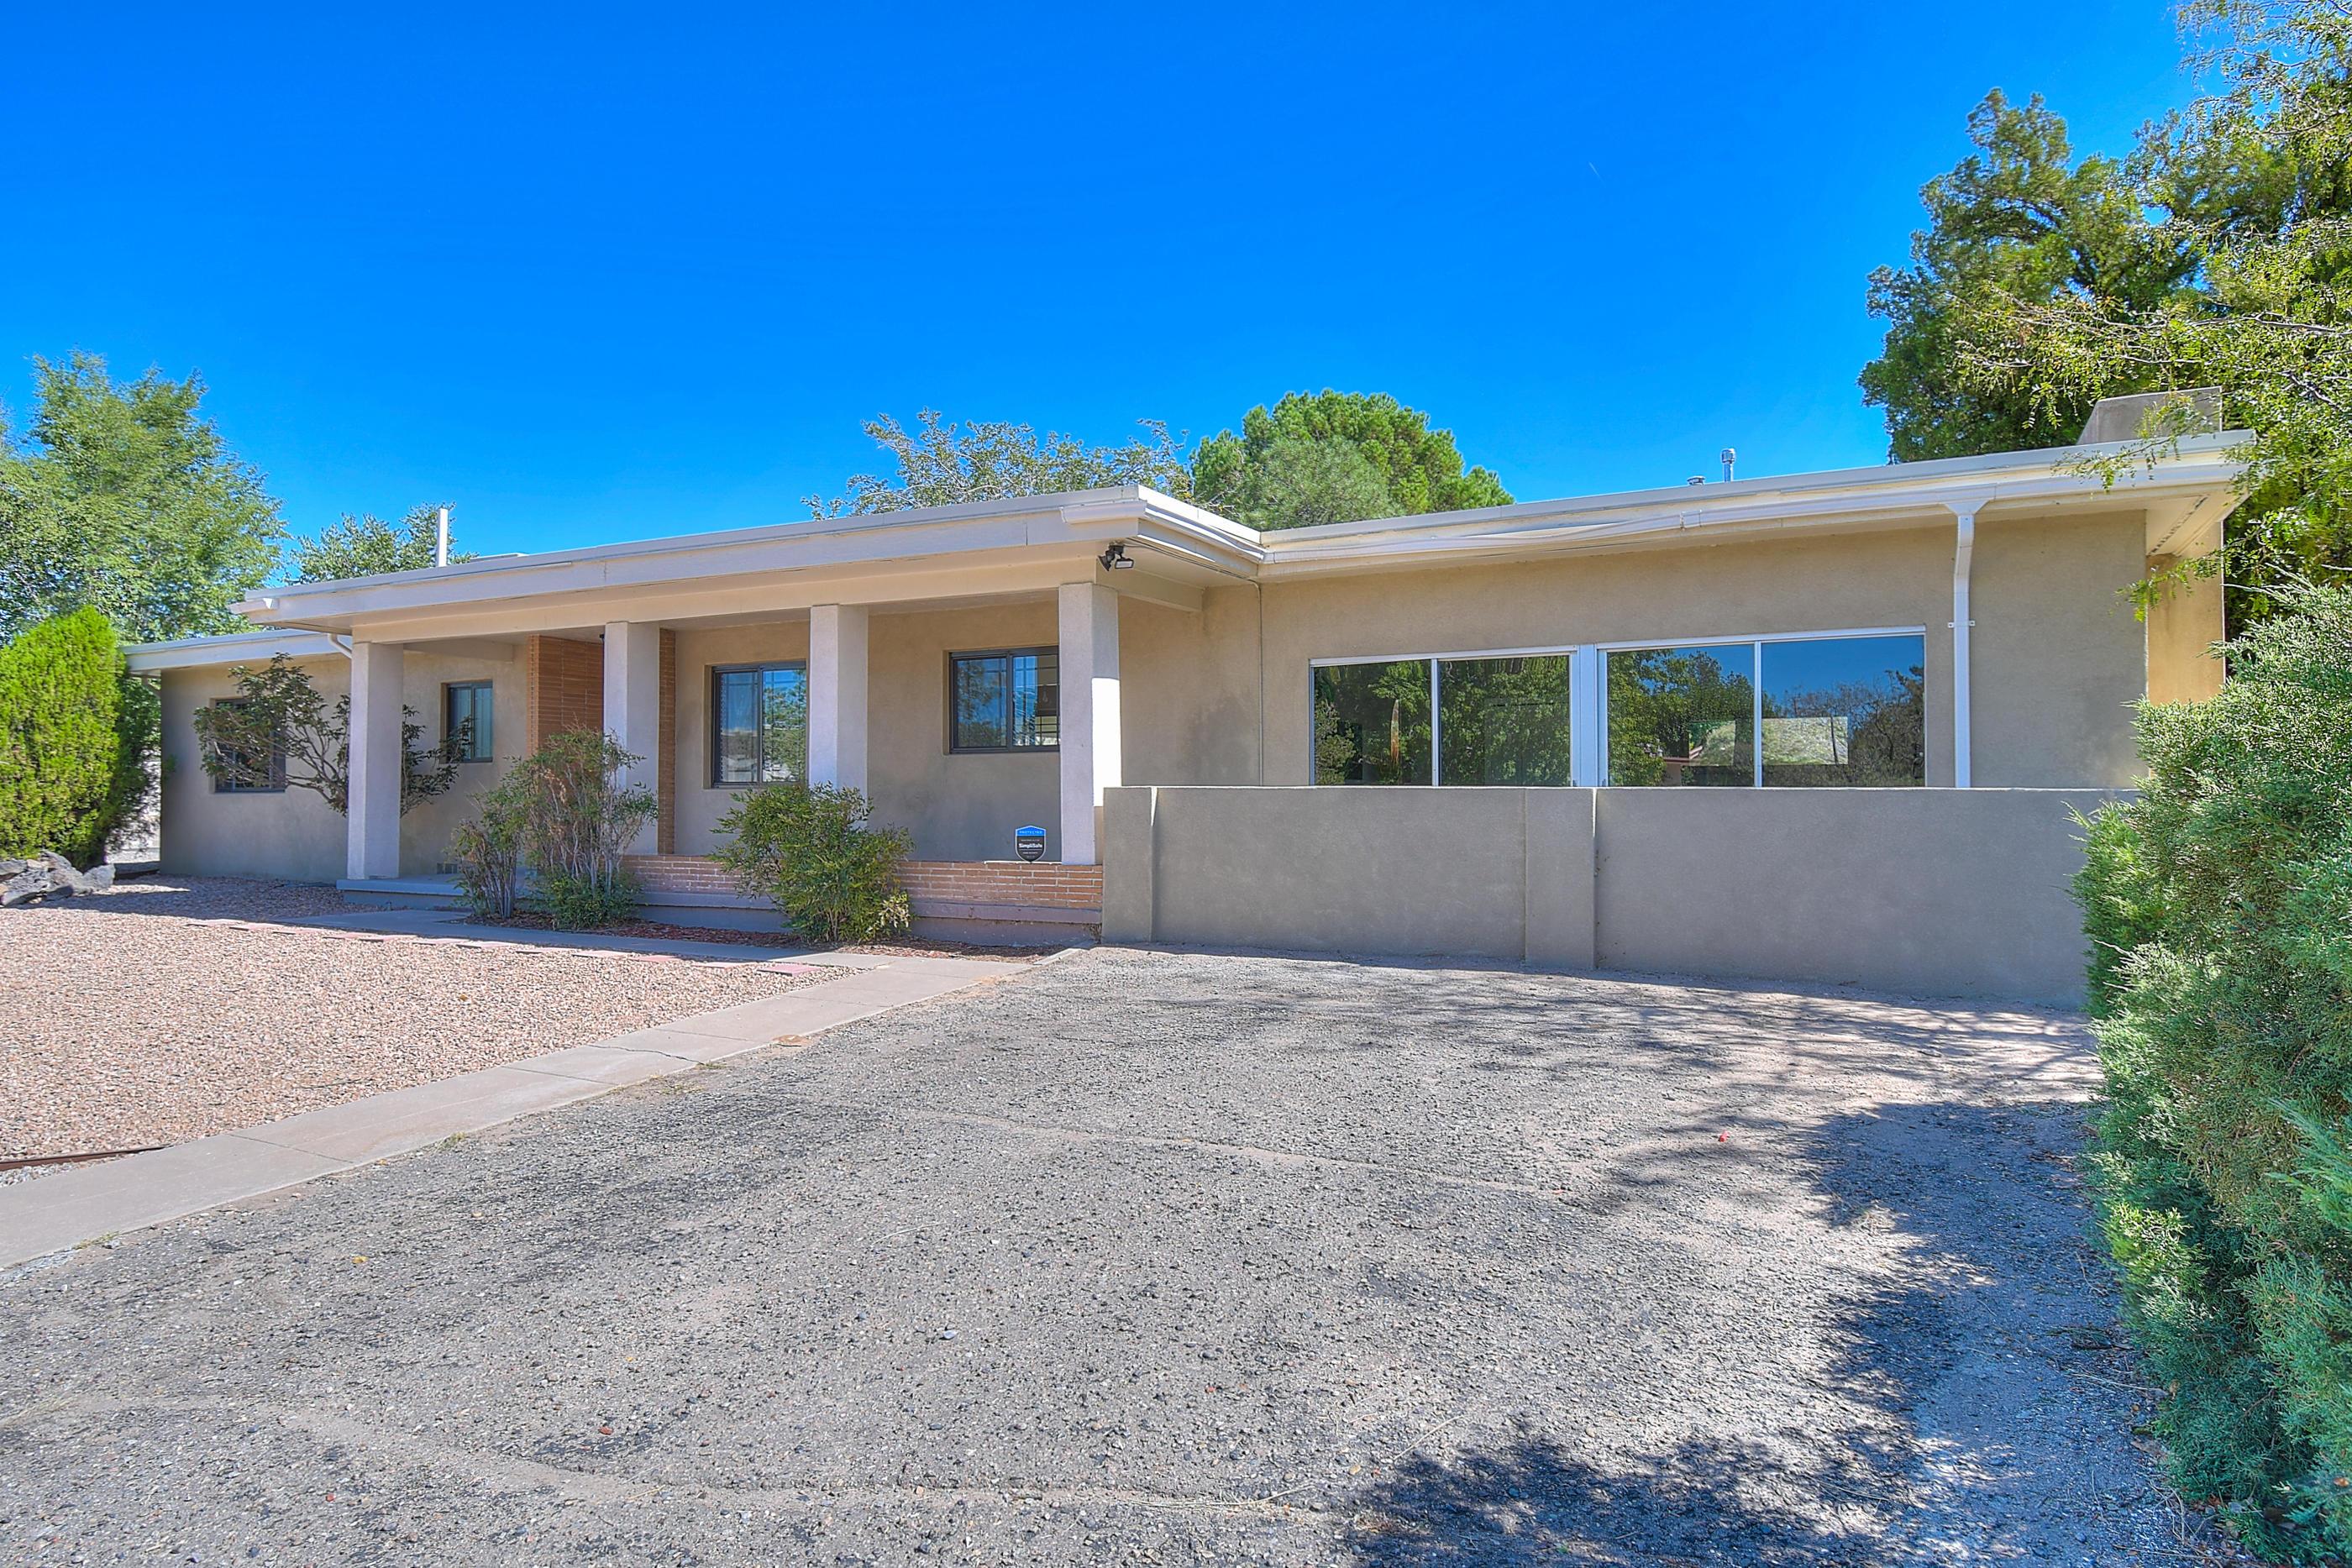 3700 LA HACIENDA Drive NE, Albuquerque, NM 87110 - Albuquerque, NM real estate listing